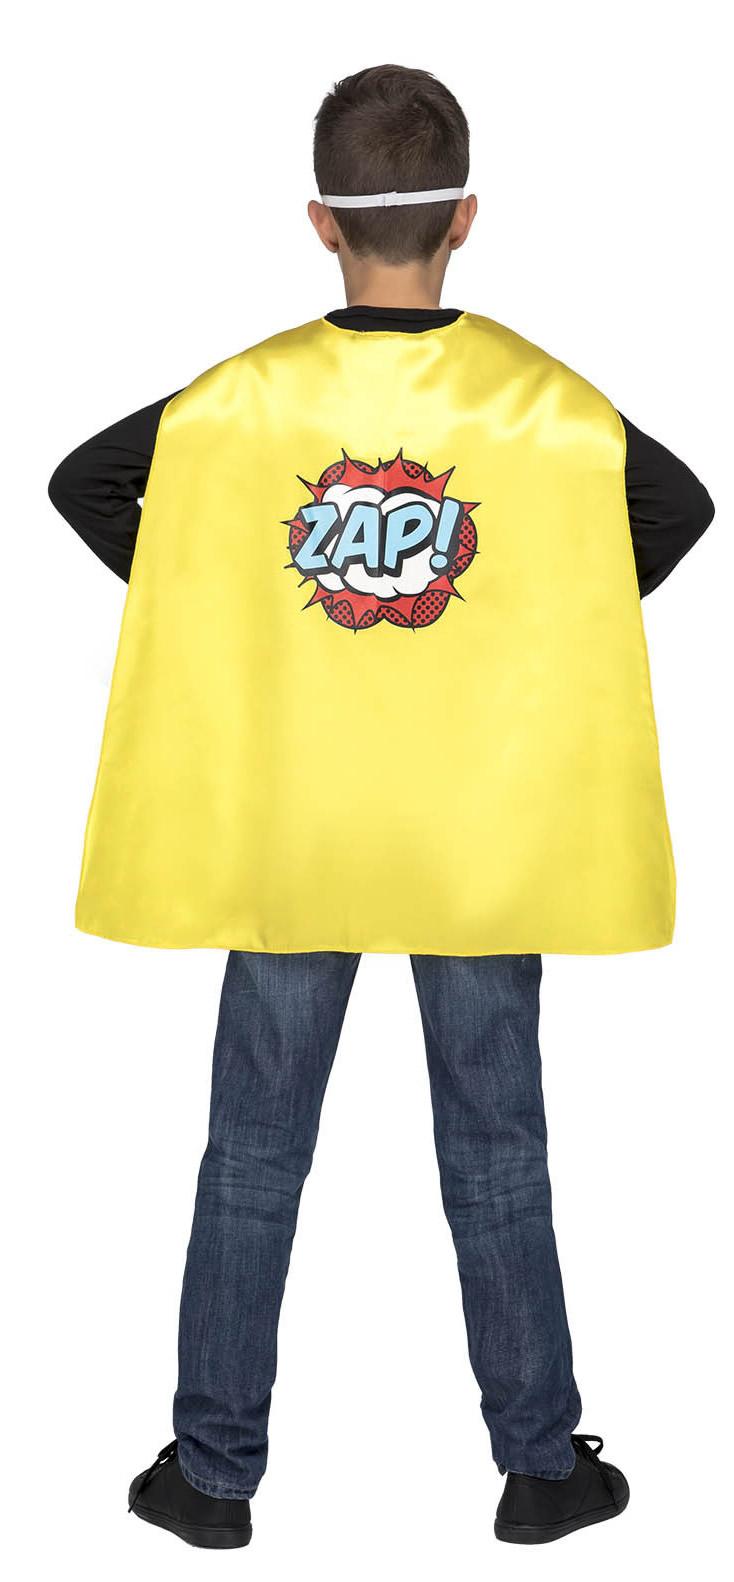 capa de superheroe amarilla infantil 4